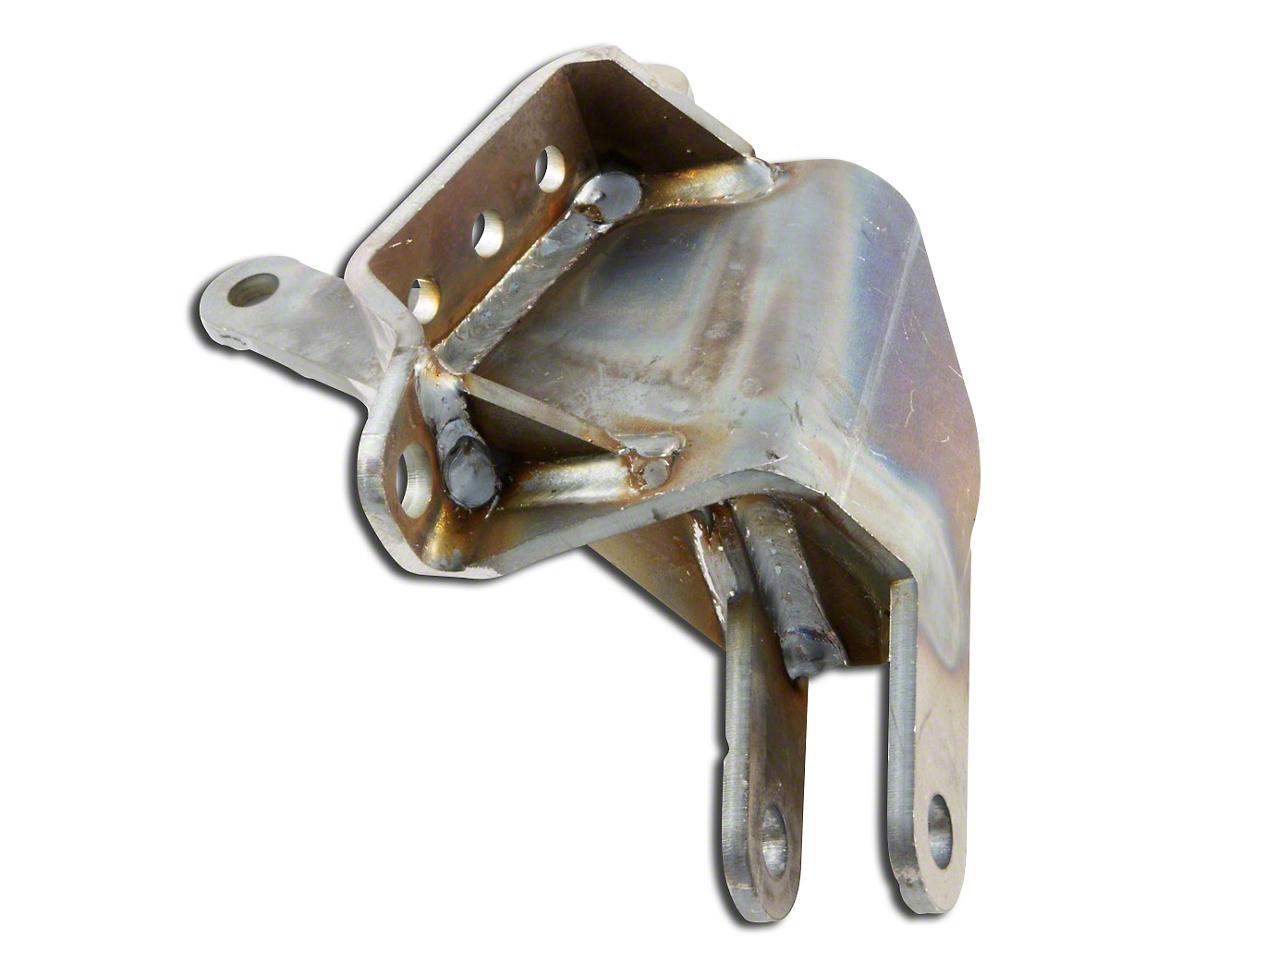 M.O.R.E. Steering Knuckle Bracket (87-95 Jeep Wrangler YJ)